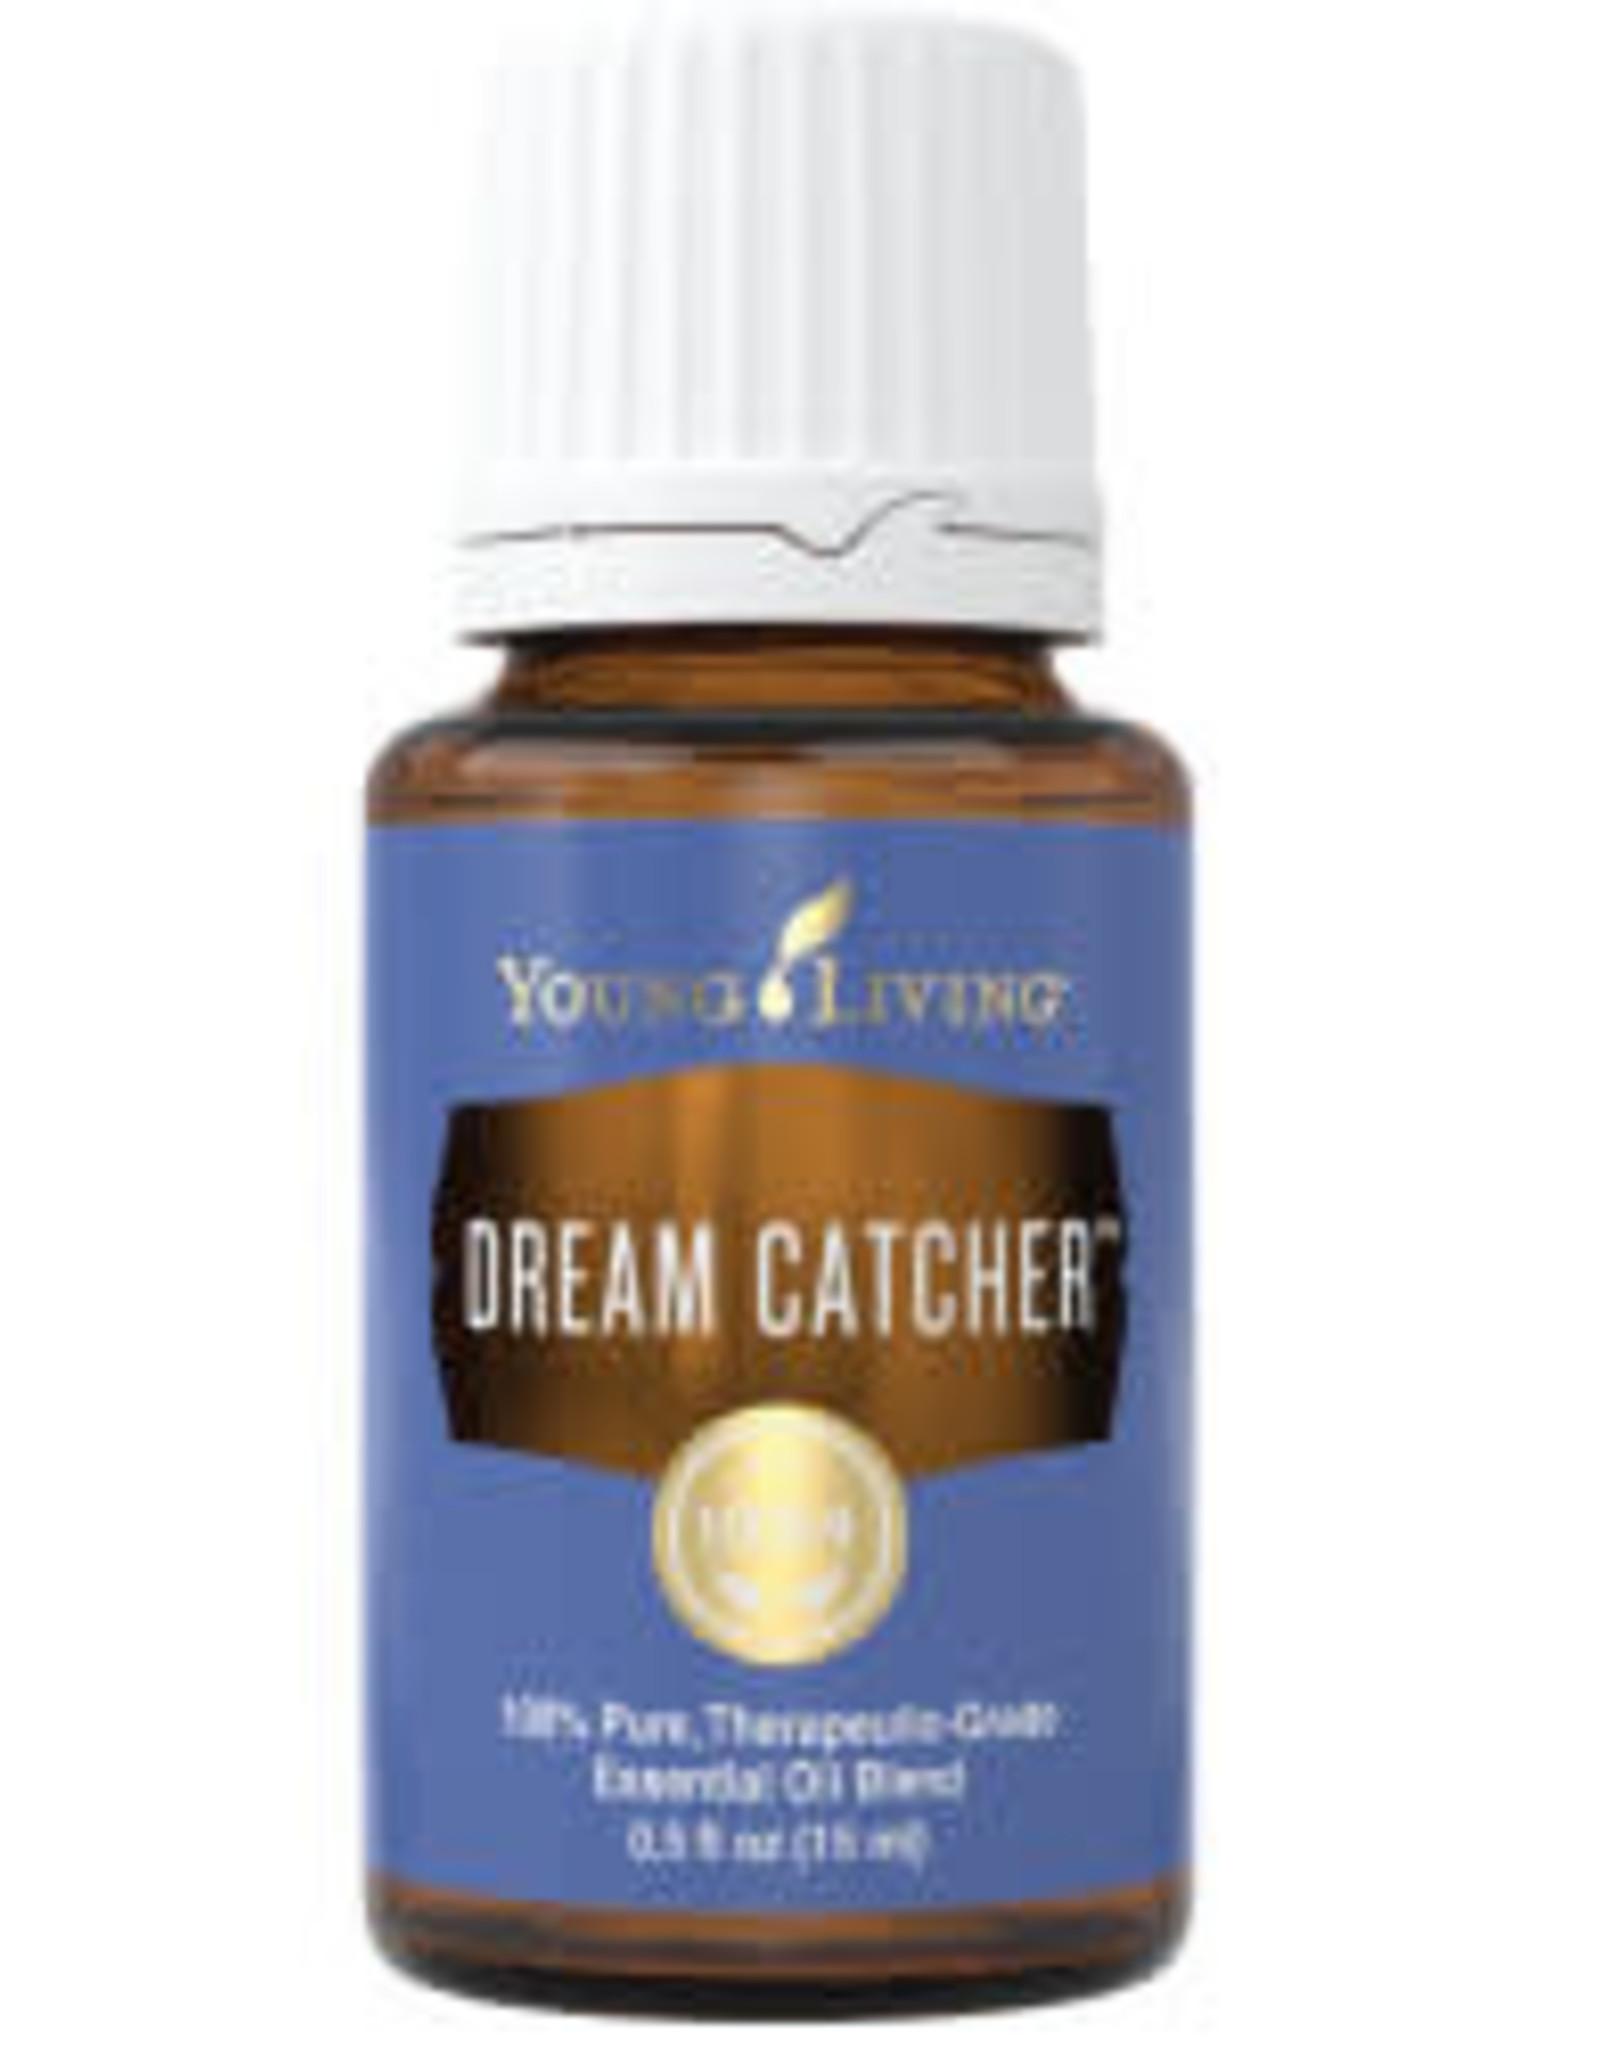 Young Living Dream Catcher Oil Blend